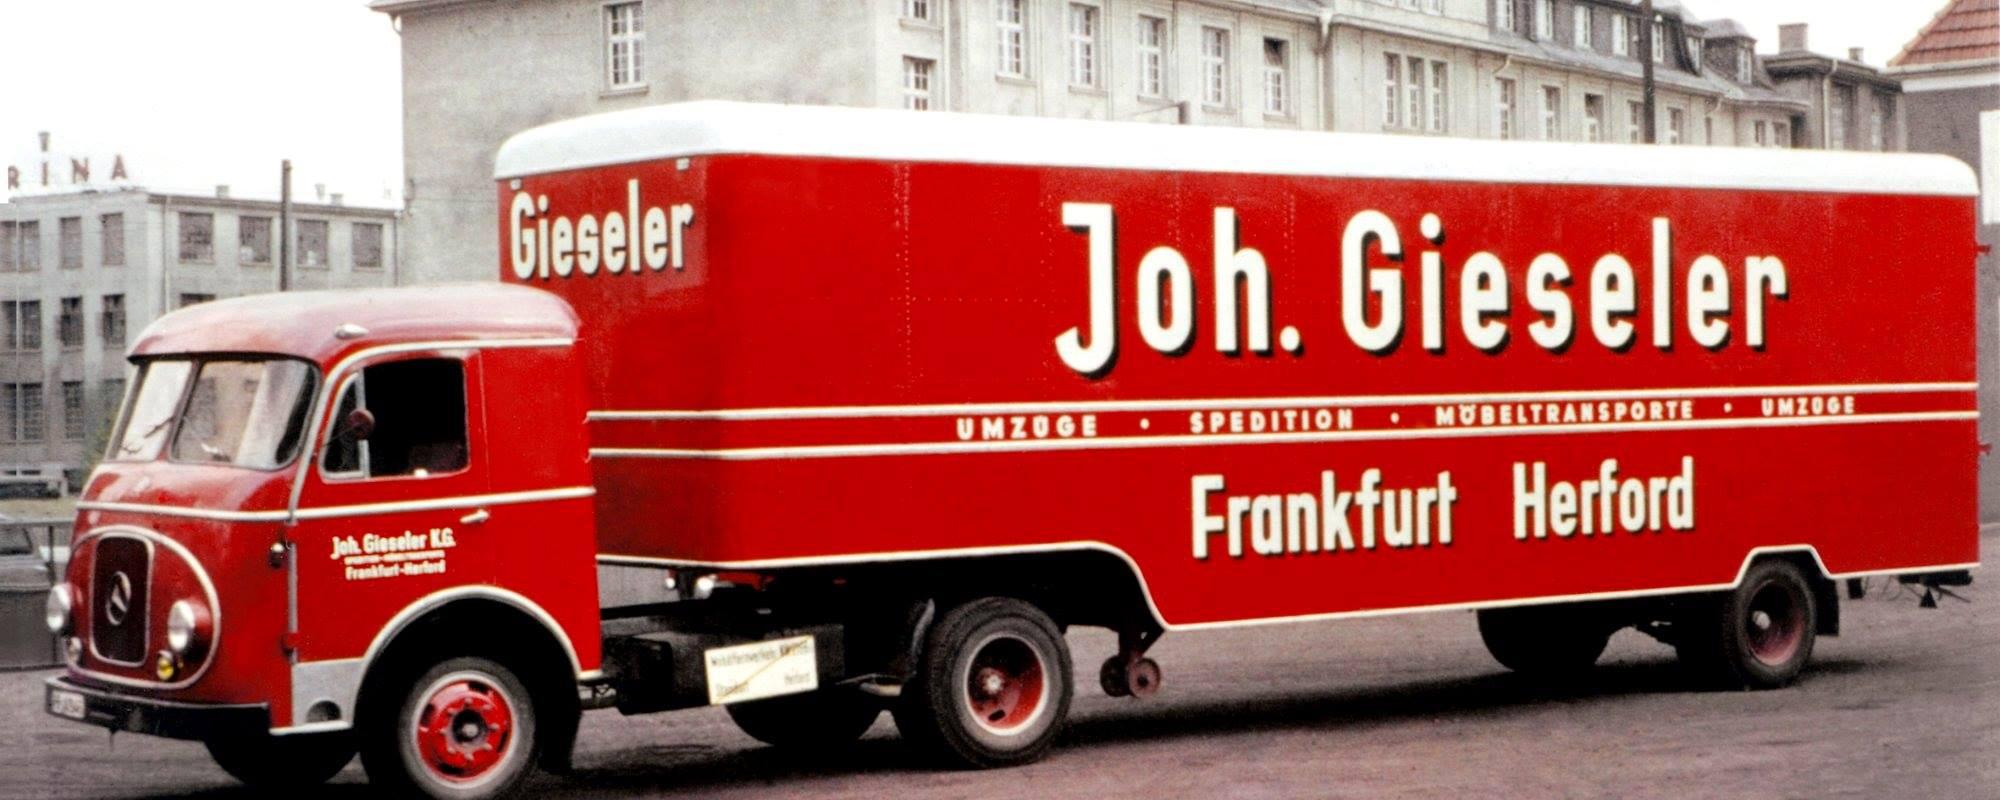 Herford-Johannes-Gieseler-Umzuge-1958